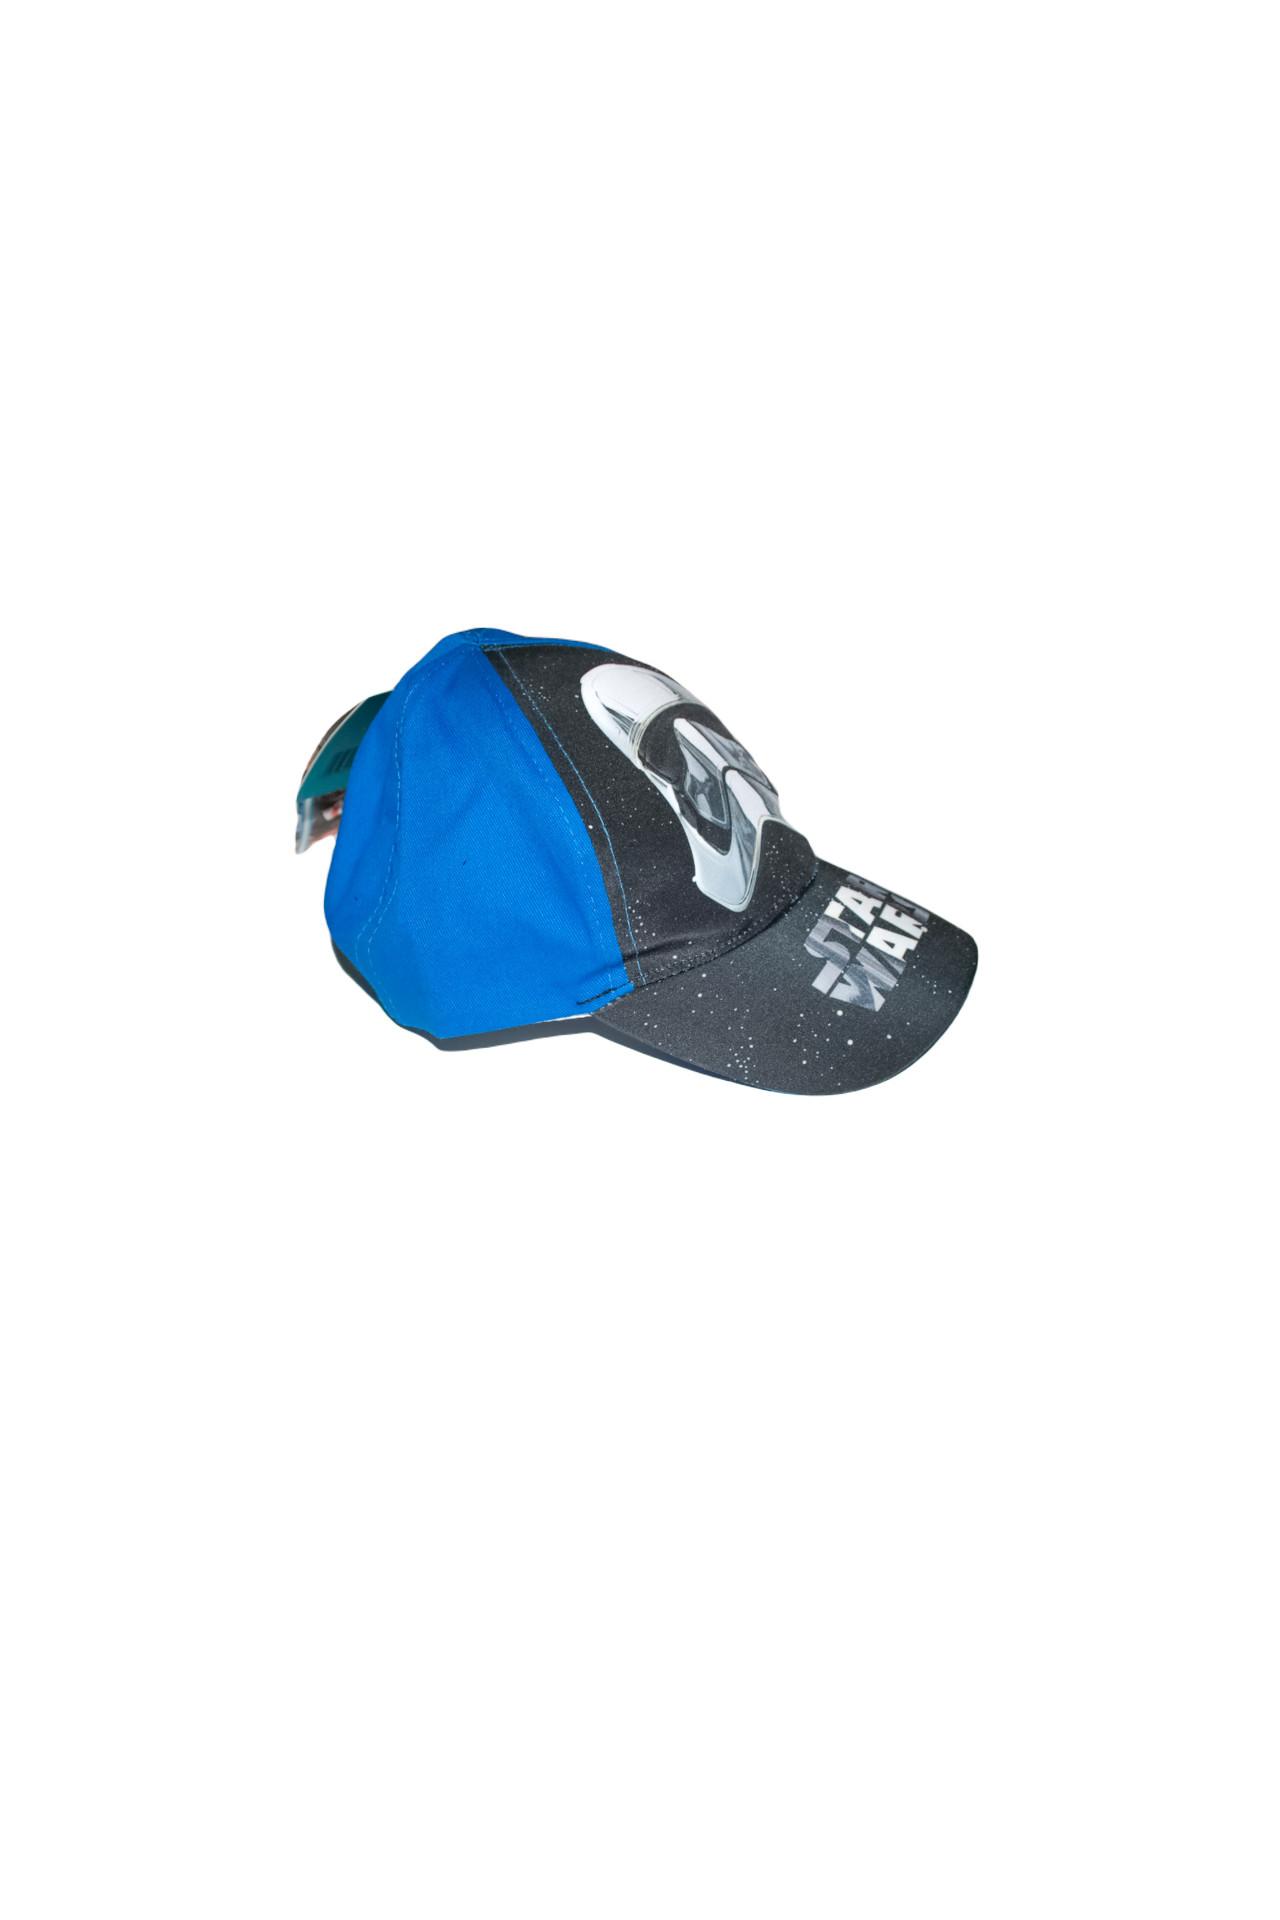 copy of Hat 52cm - 2